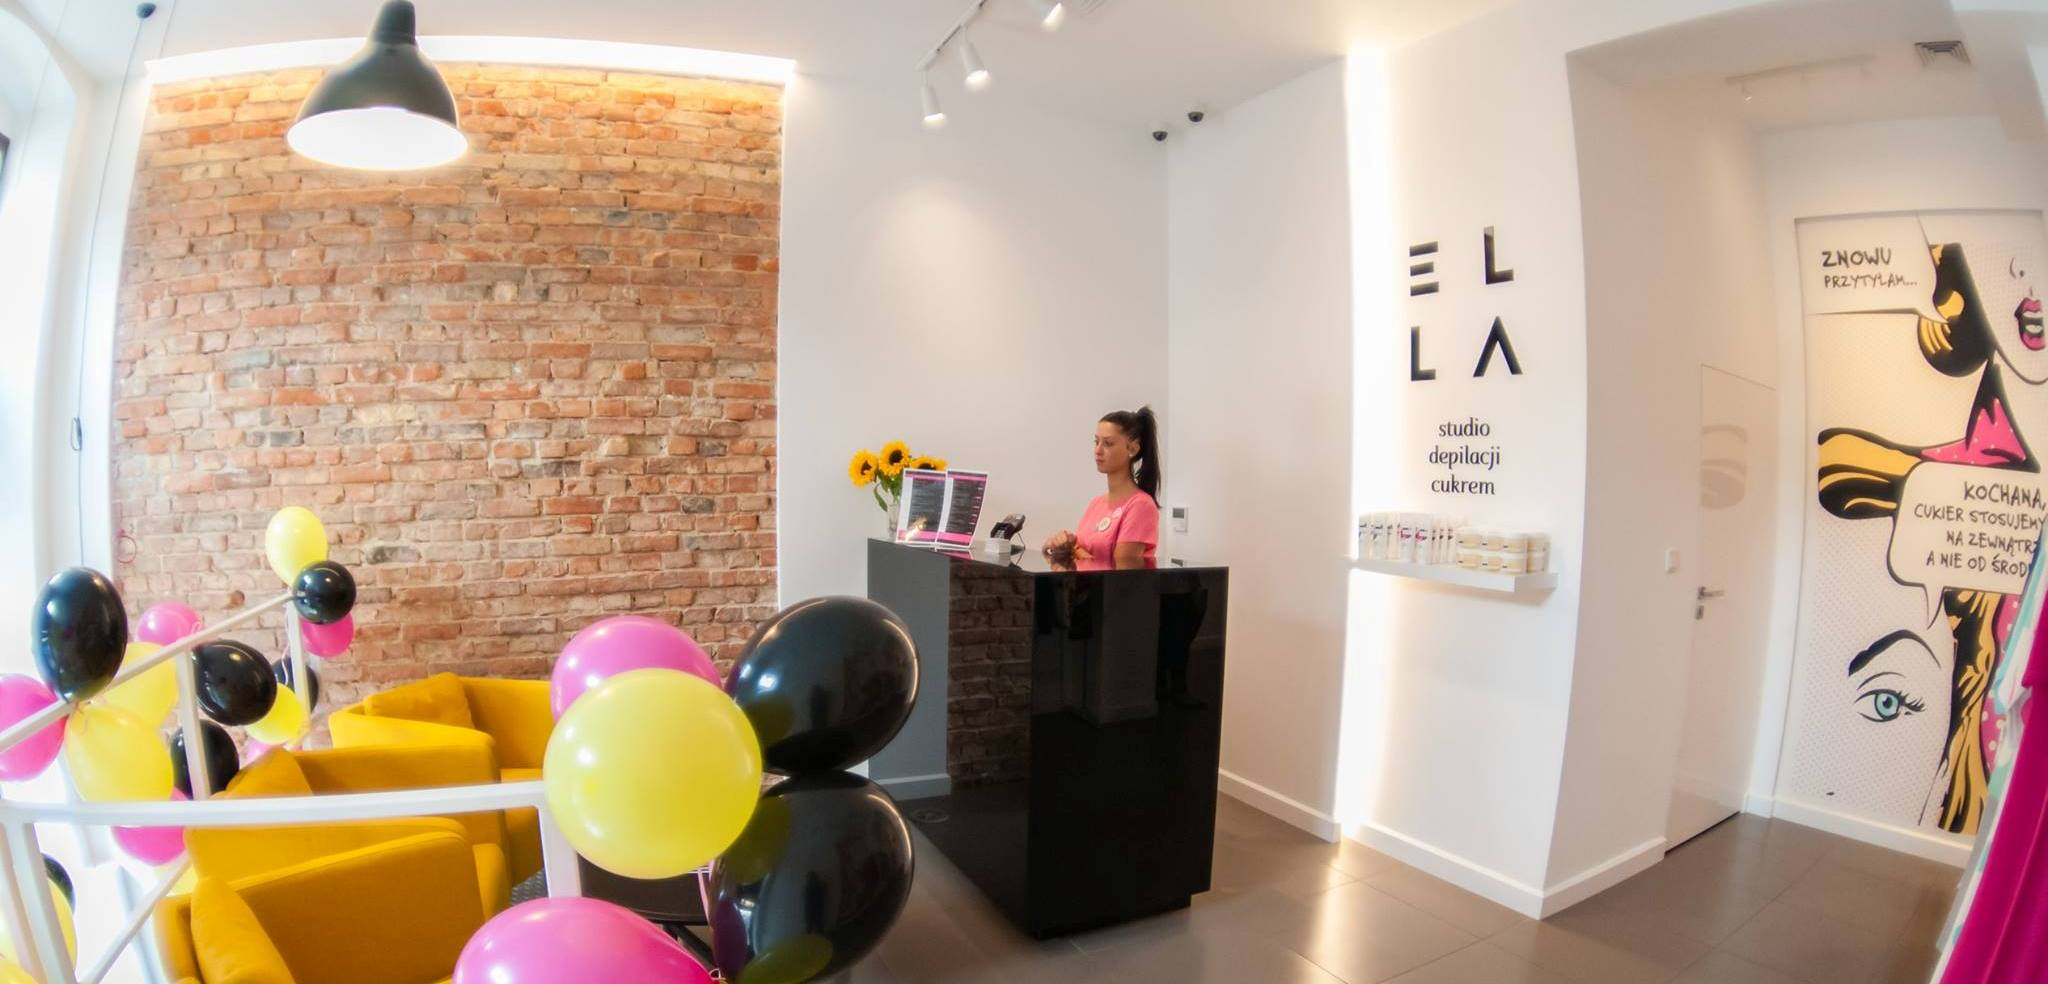 Ella Studio Depilacji Cukrem